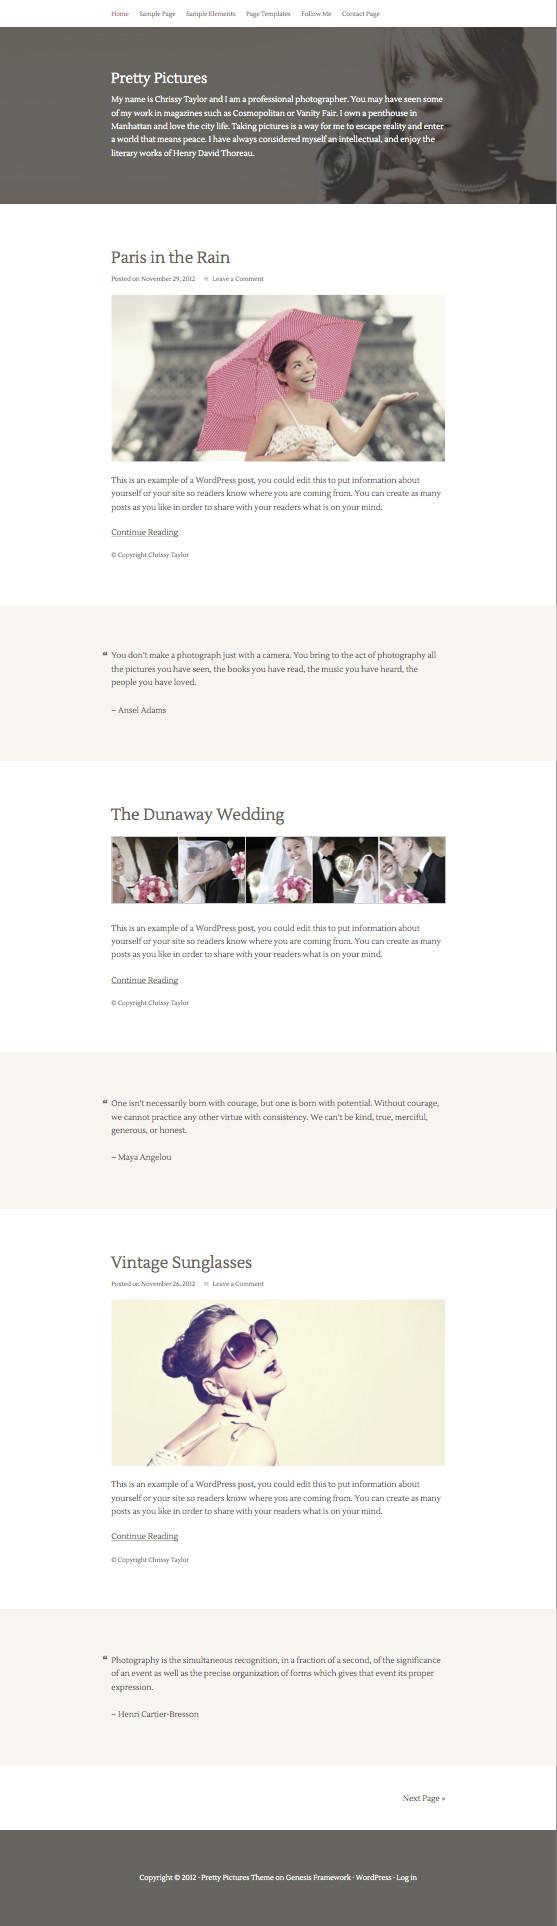 Pretty Pictures WordPress Photographic Theme